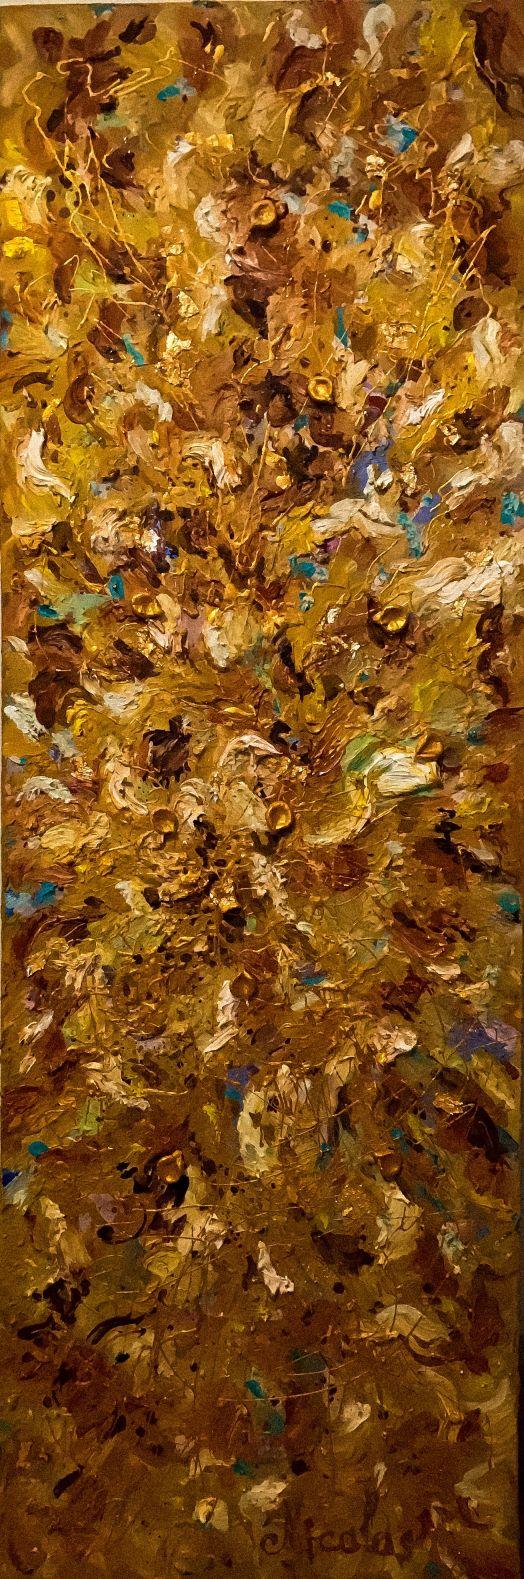 """Otoño dorado"" (2019) - Pintor Nicolas"